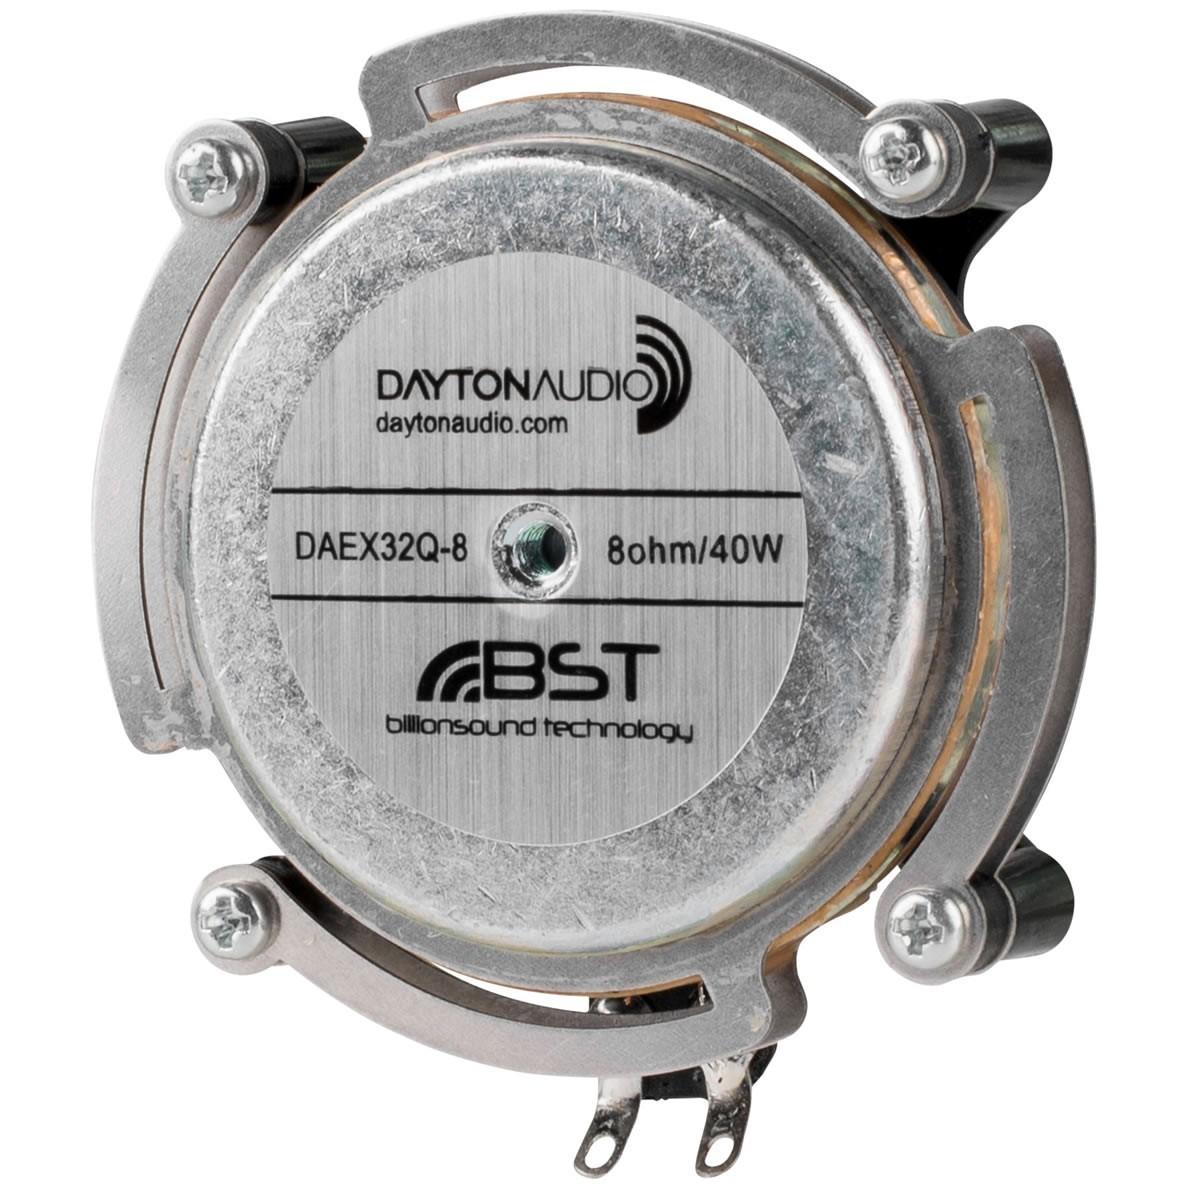 DAYTON AUDIO DAEX32Q-8 Speaker Driver Exciter Bodyshaker 20W 8 Ohm Ø 3.2cm